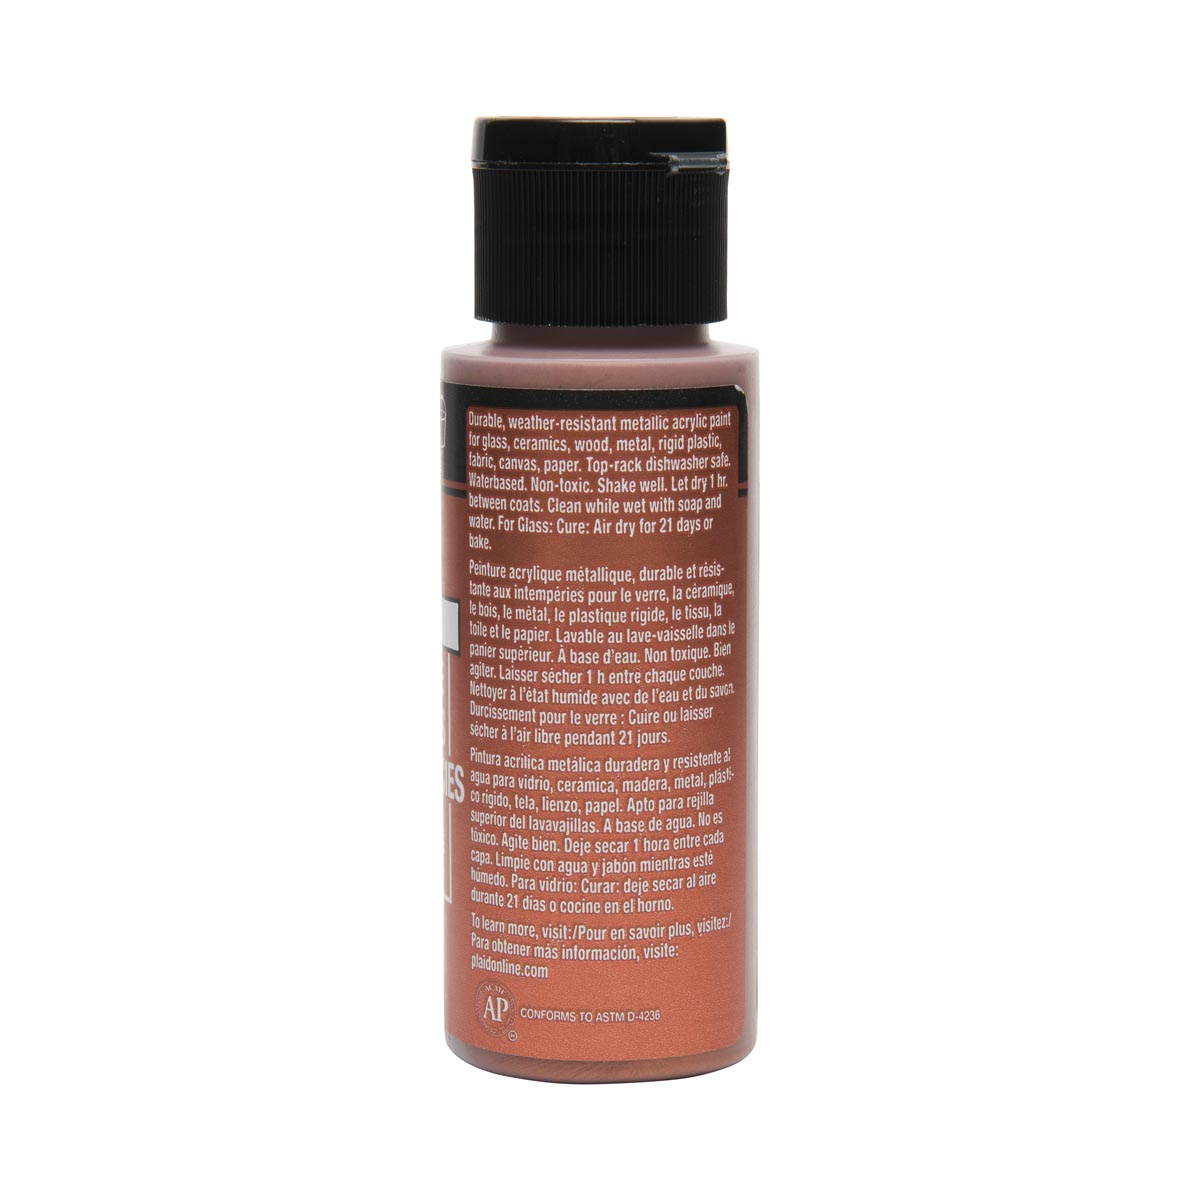 FolkArt ® Multi-Surface Metallic Acrylic Paints - Copper, 2 oz. - 6305